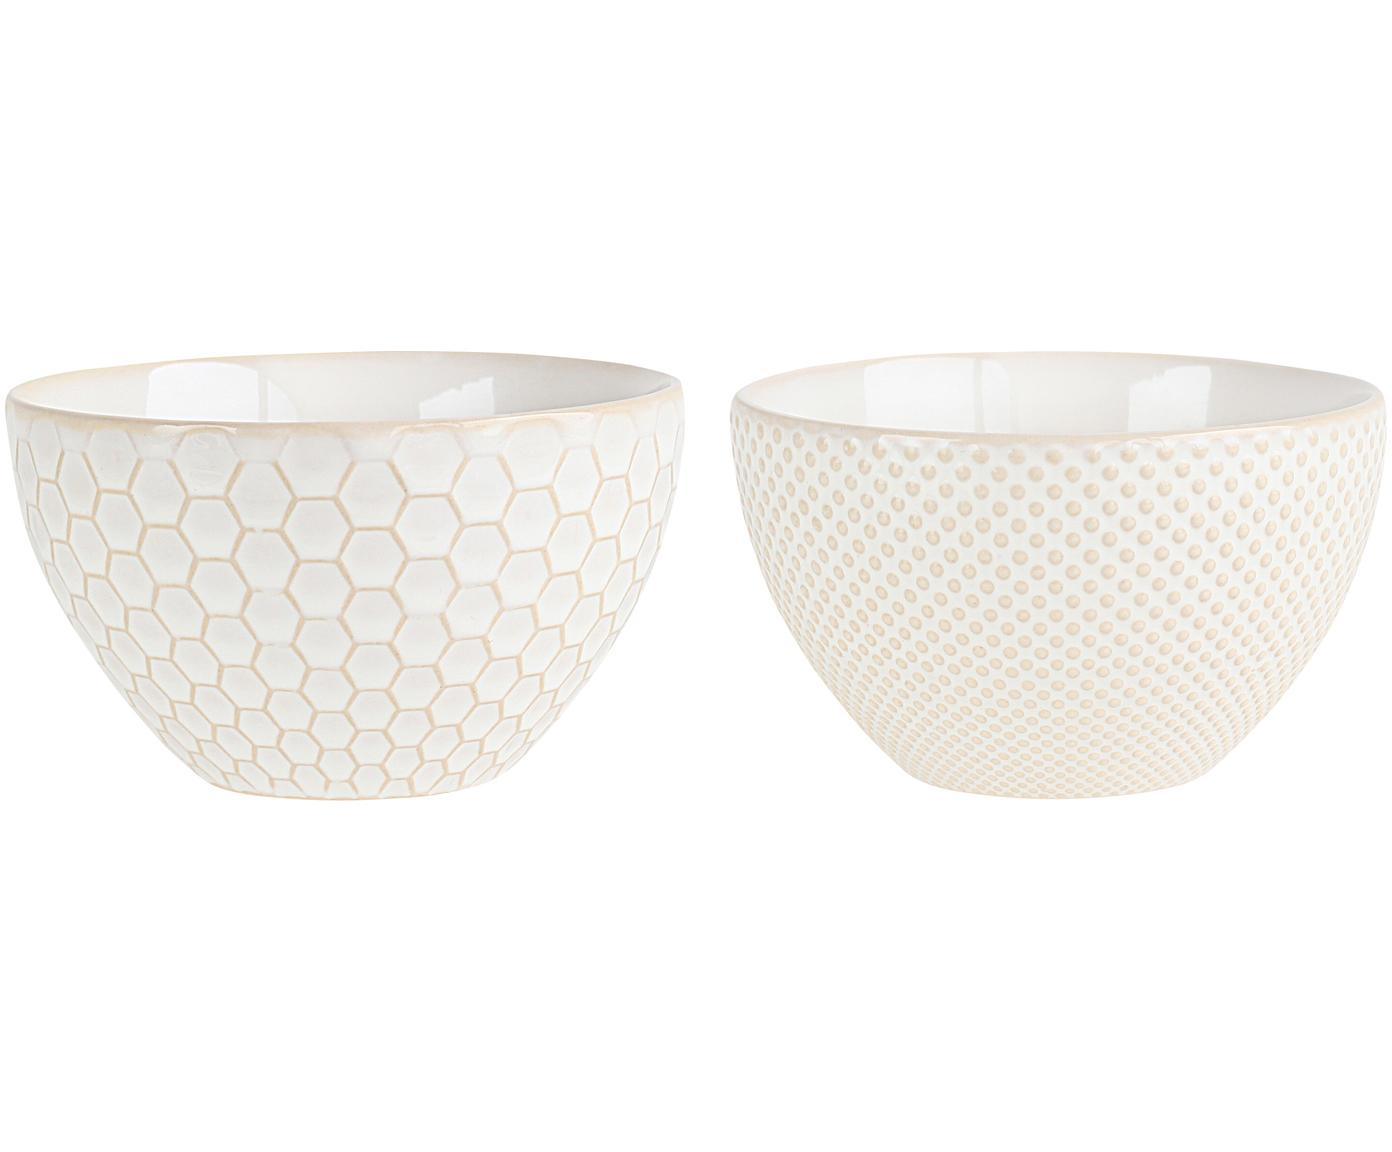 Set ciotole Linna 4 pz, Ceramica, Bianco spezzato, beige, Ø 13 x Alt. 7 cm